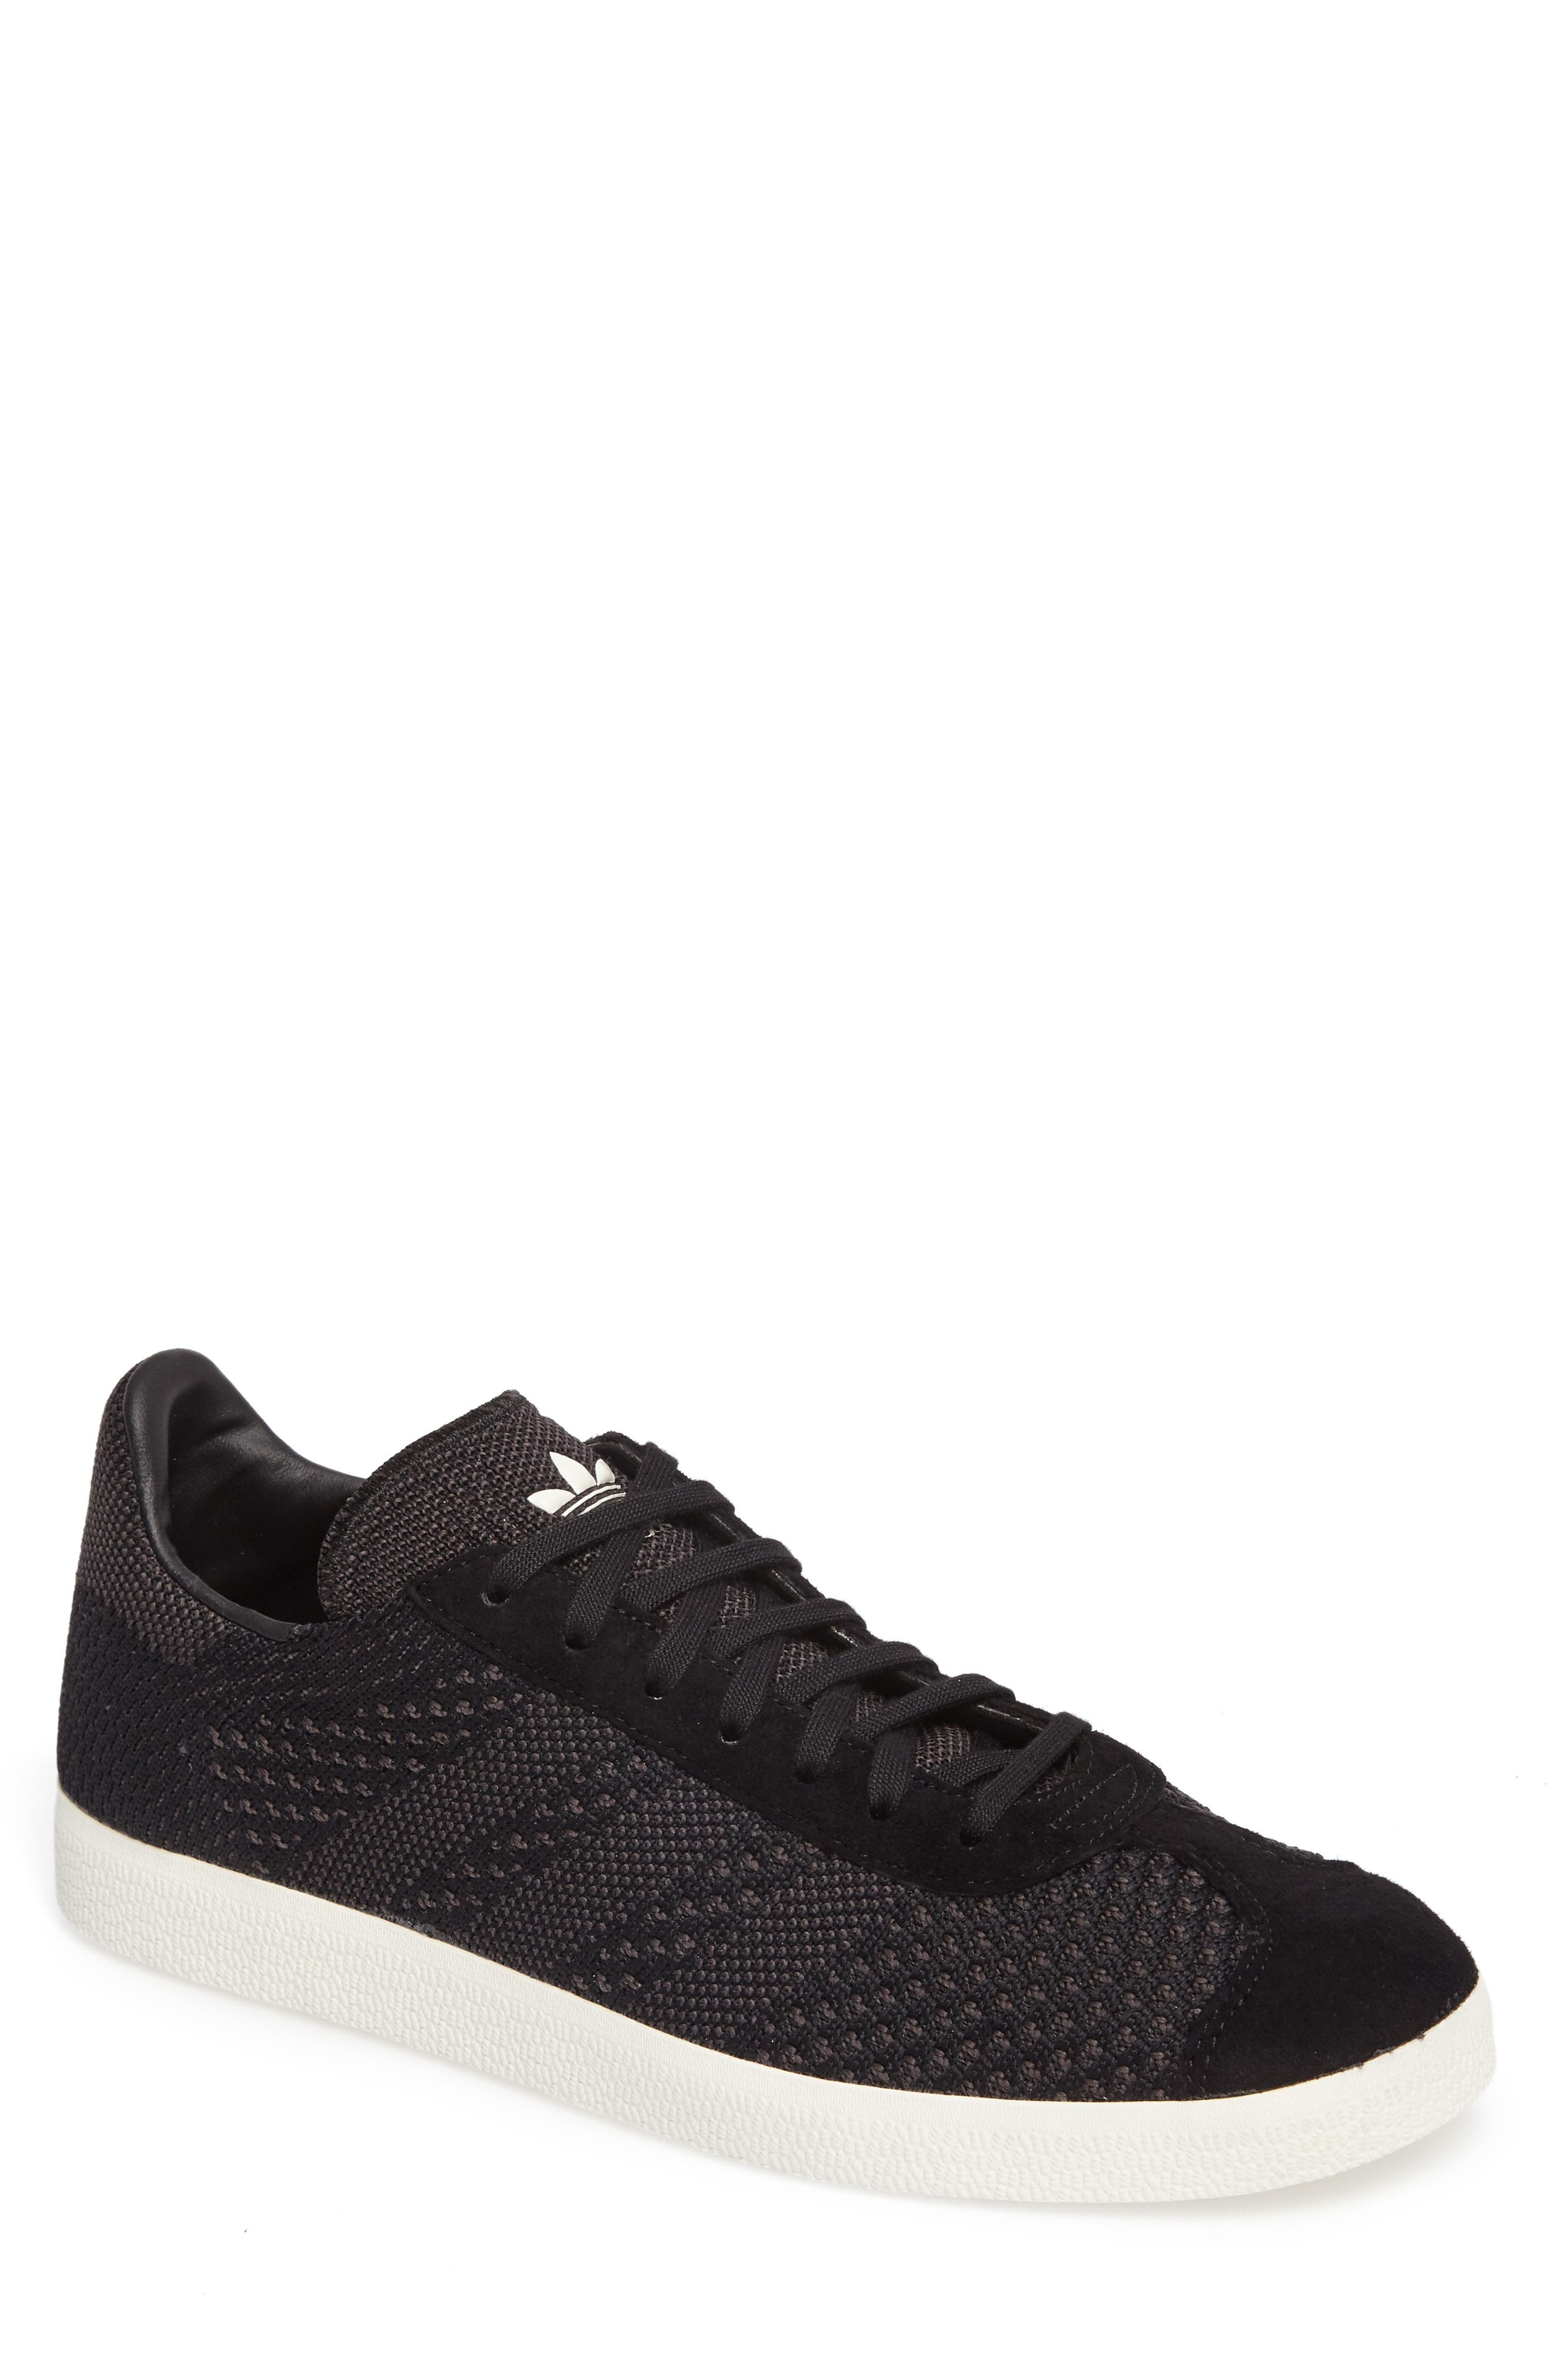 Gazelle Primeknit Sneaker,                         Main,                         color, 001